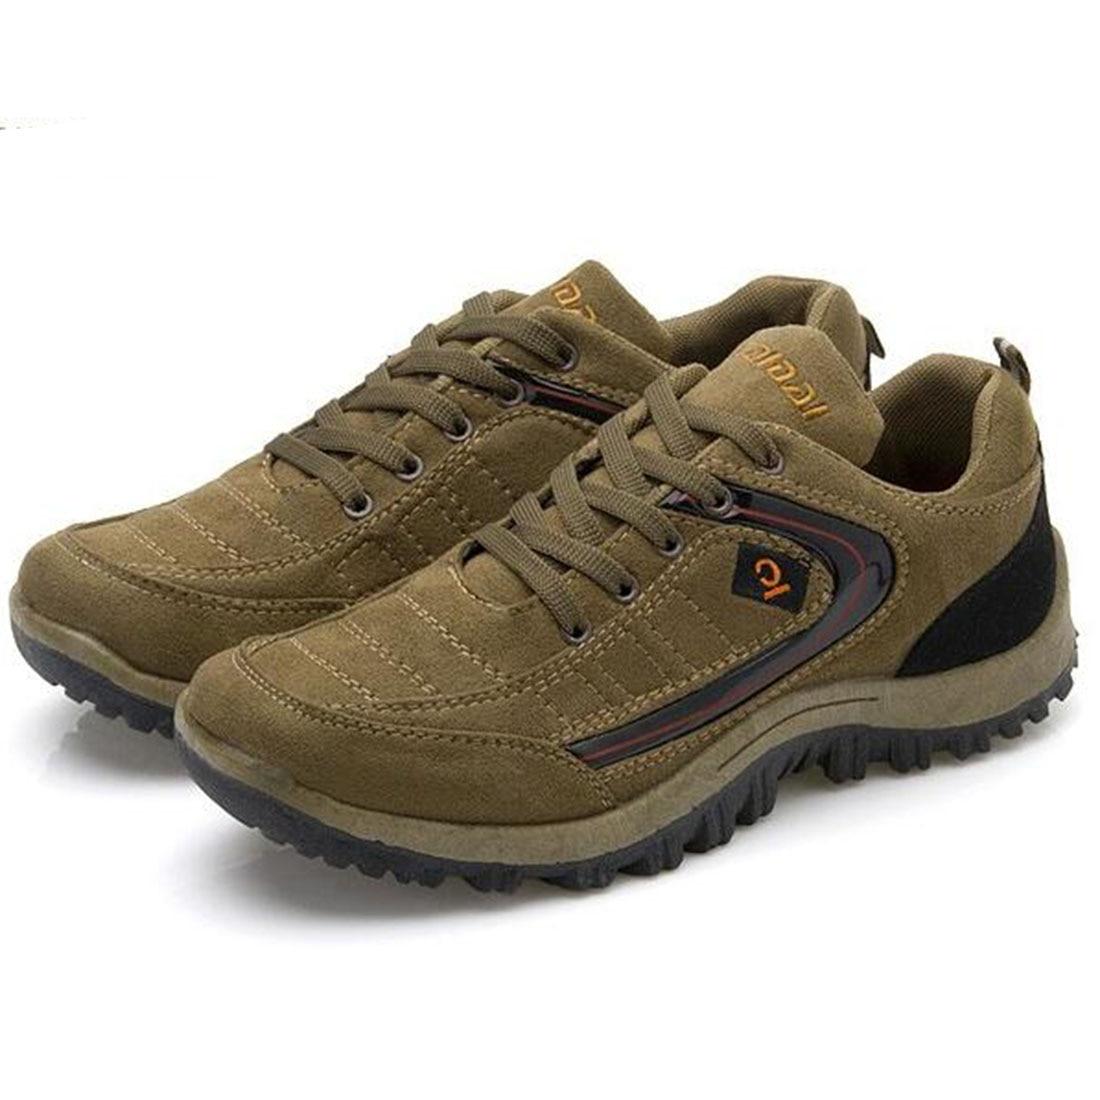 ФОТО shoes me Hot Big Size EU 44 Men Casual Shoes Men Winter Boots Warm Ankle Boot Snow Work shoes Fashion shoes Zapatillas hombre